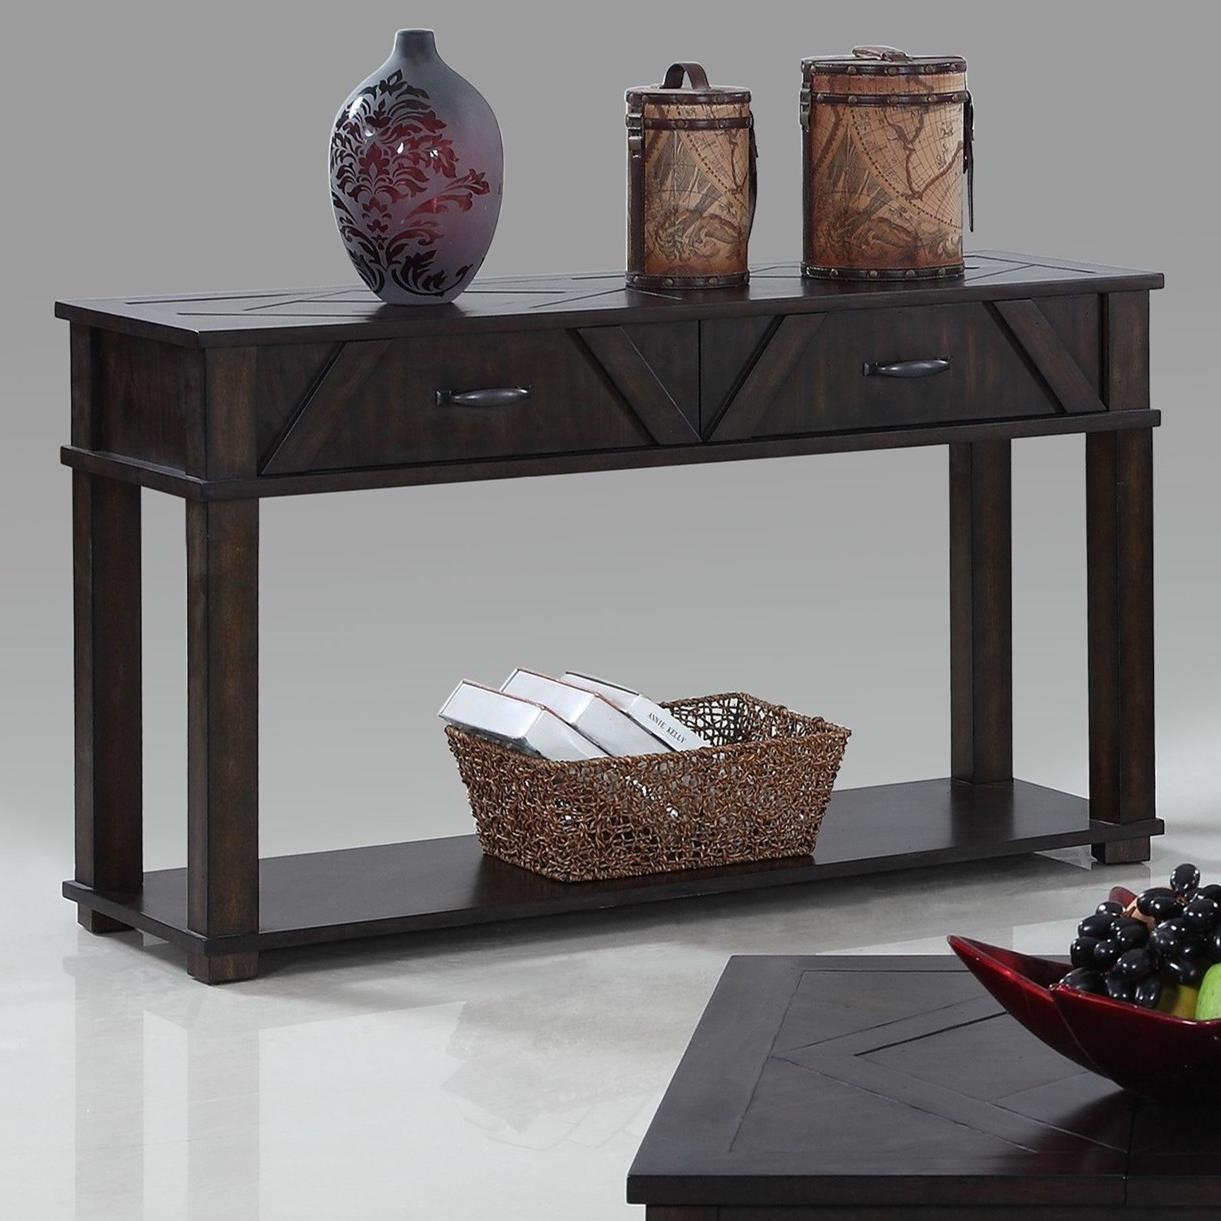 Progressive furniture foxcroft rustic sofa console table for Sofa table rules